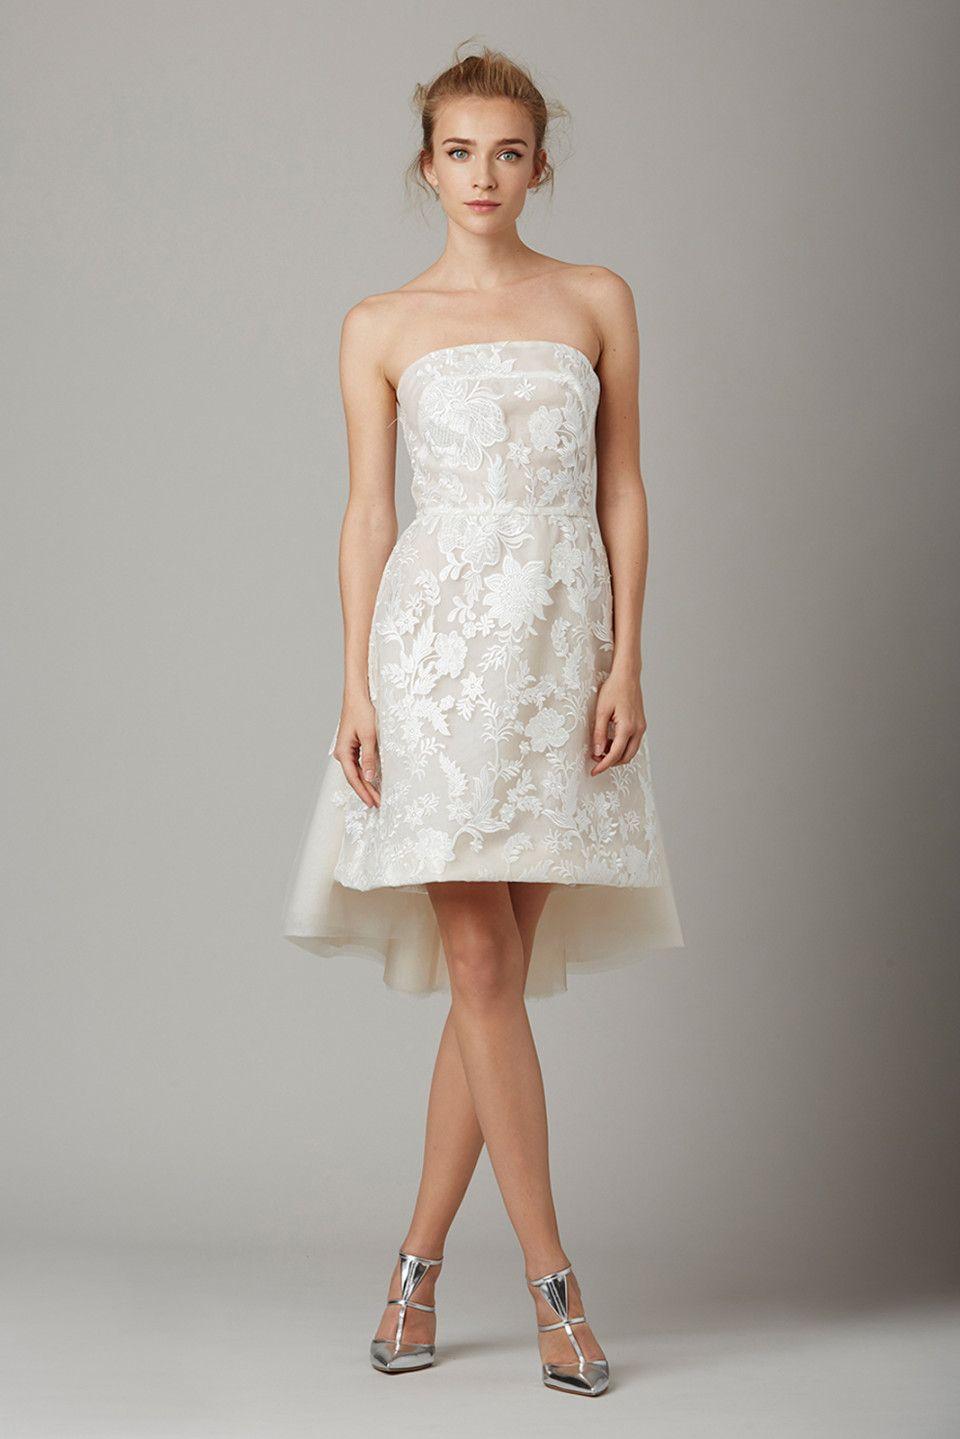 DRESSES - Short dresses Lela Rose C7d23VByE